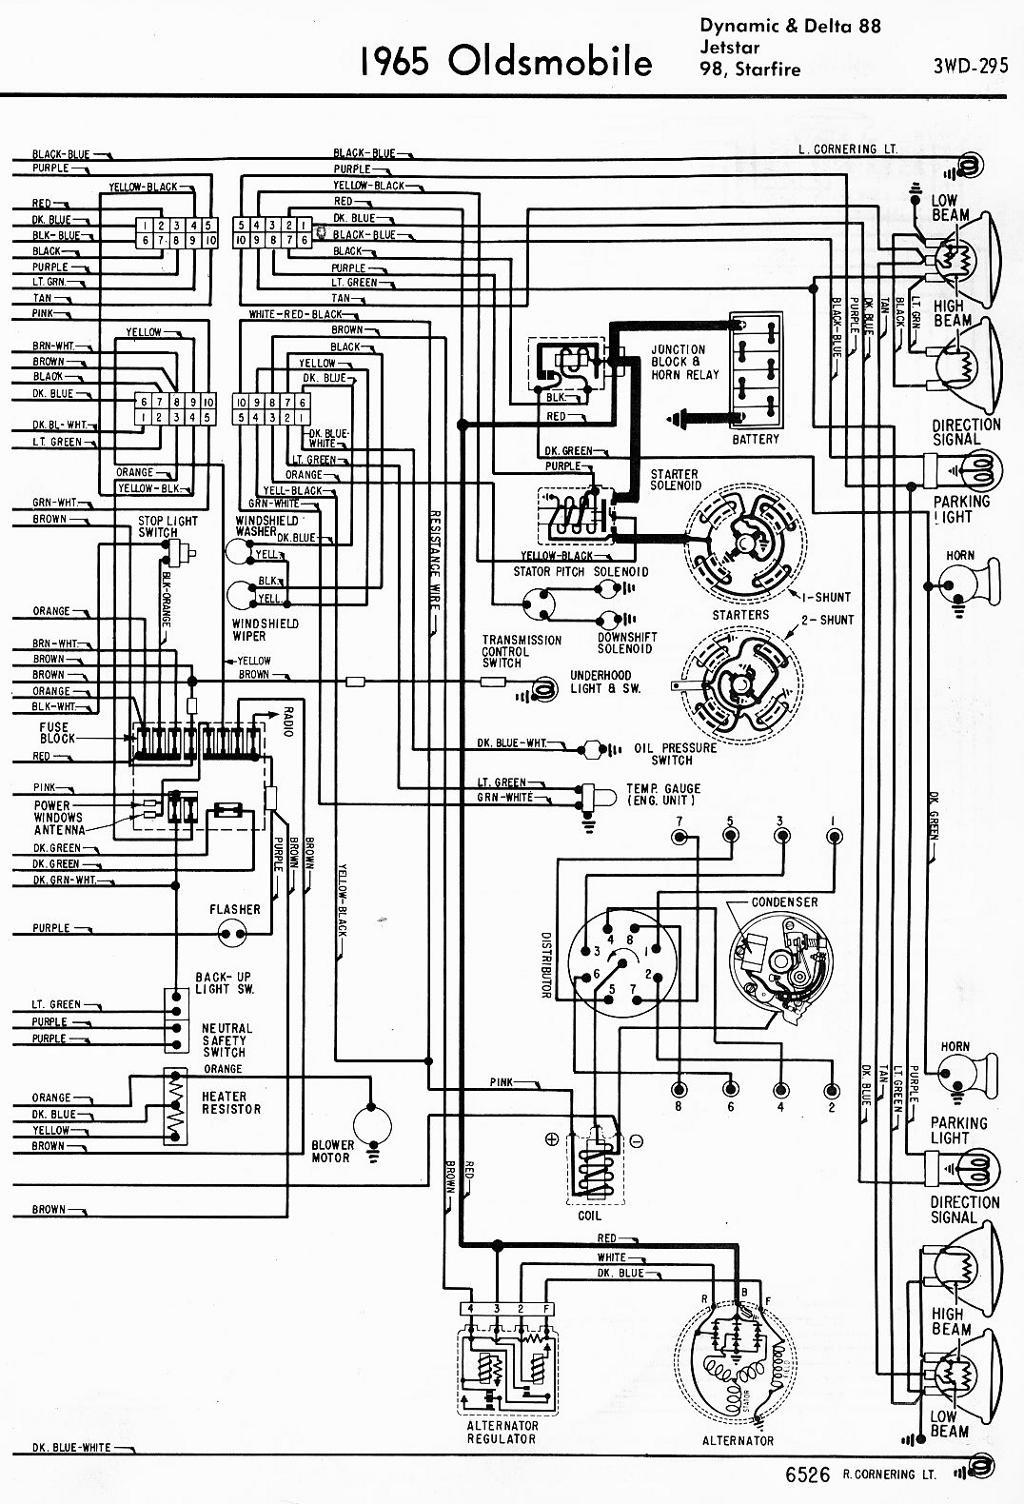 1992 oldsmobile 88 wiring diagram wiring diagram third level rh 10 8 19 jacobwinterstein com 1999 taurus wiring diagram 1999 buick century wiring diagram [ 1024 x 1504 Pixel ]